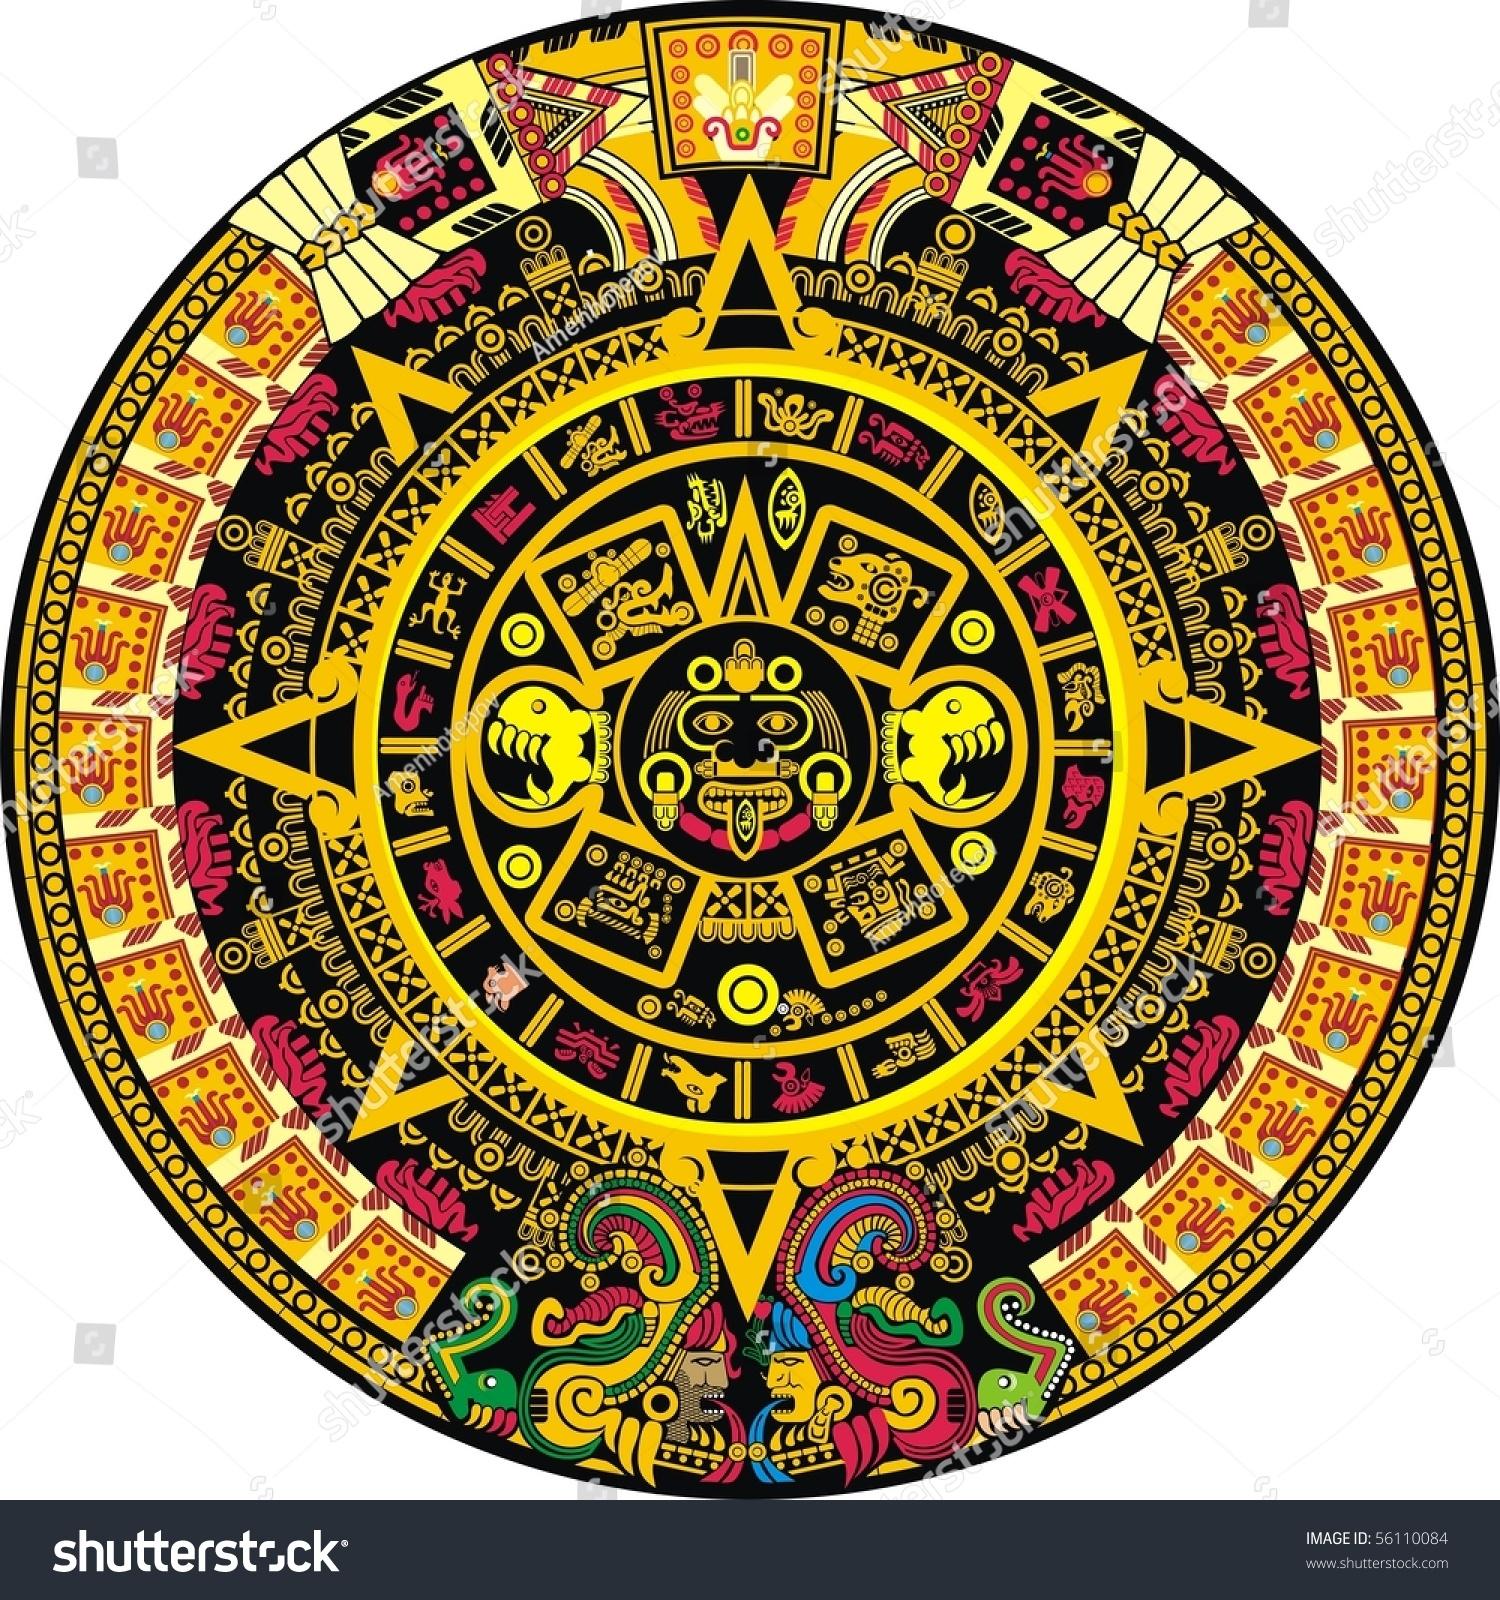 Aztec Calendar Zodiac Signs • Printable Blank Calendar Template inside Aztec Calendar Printable Template